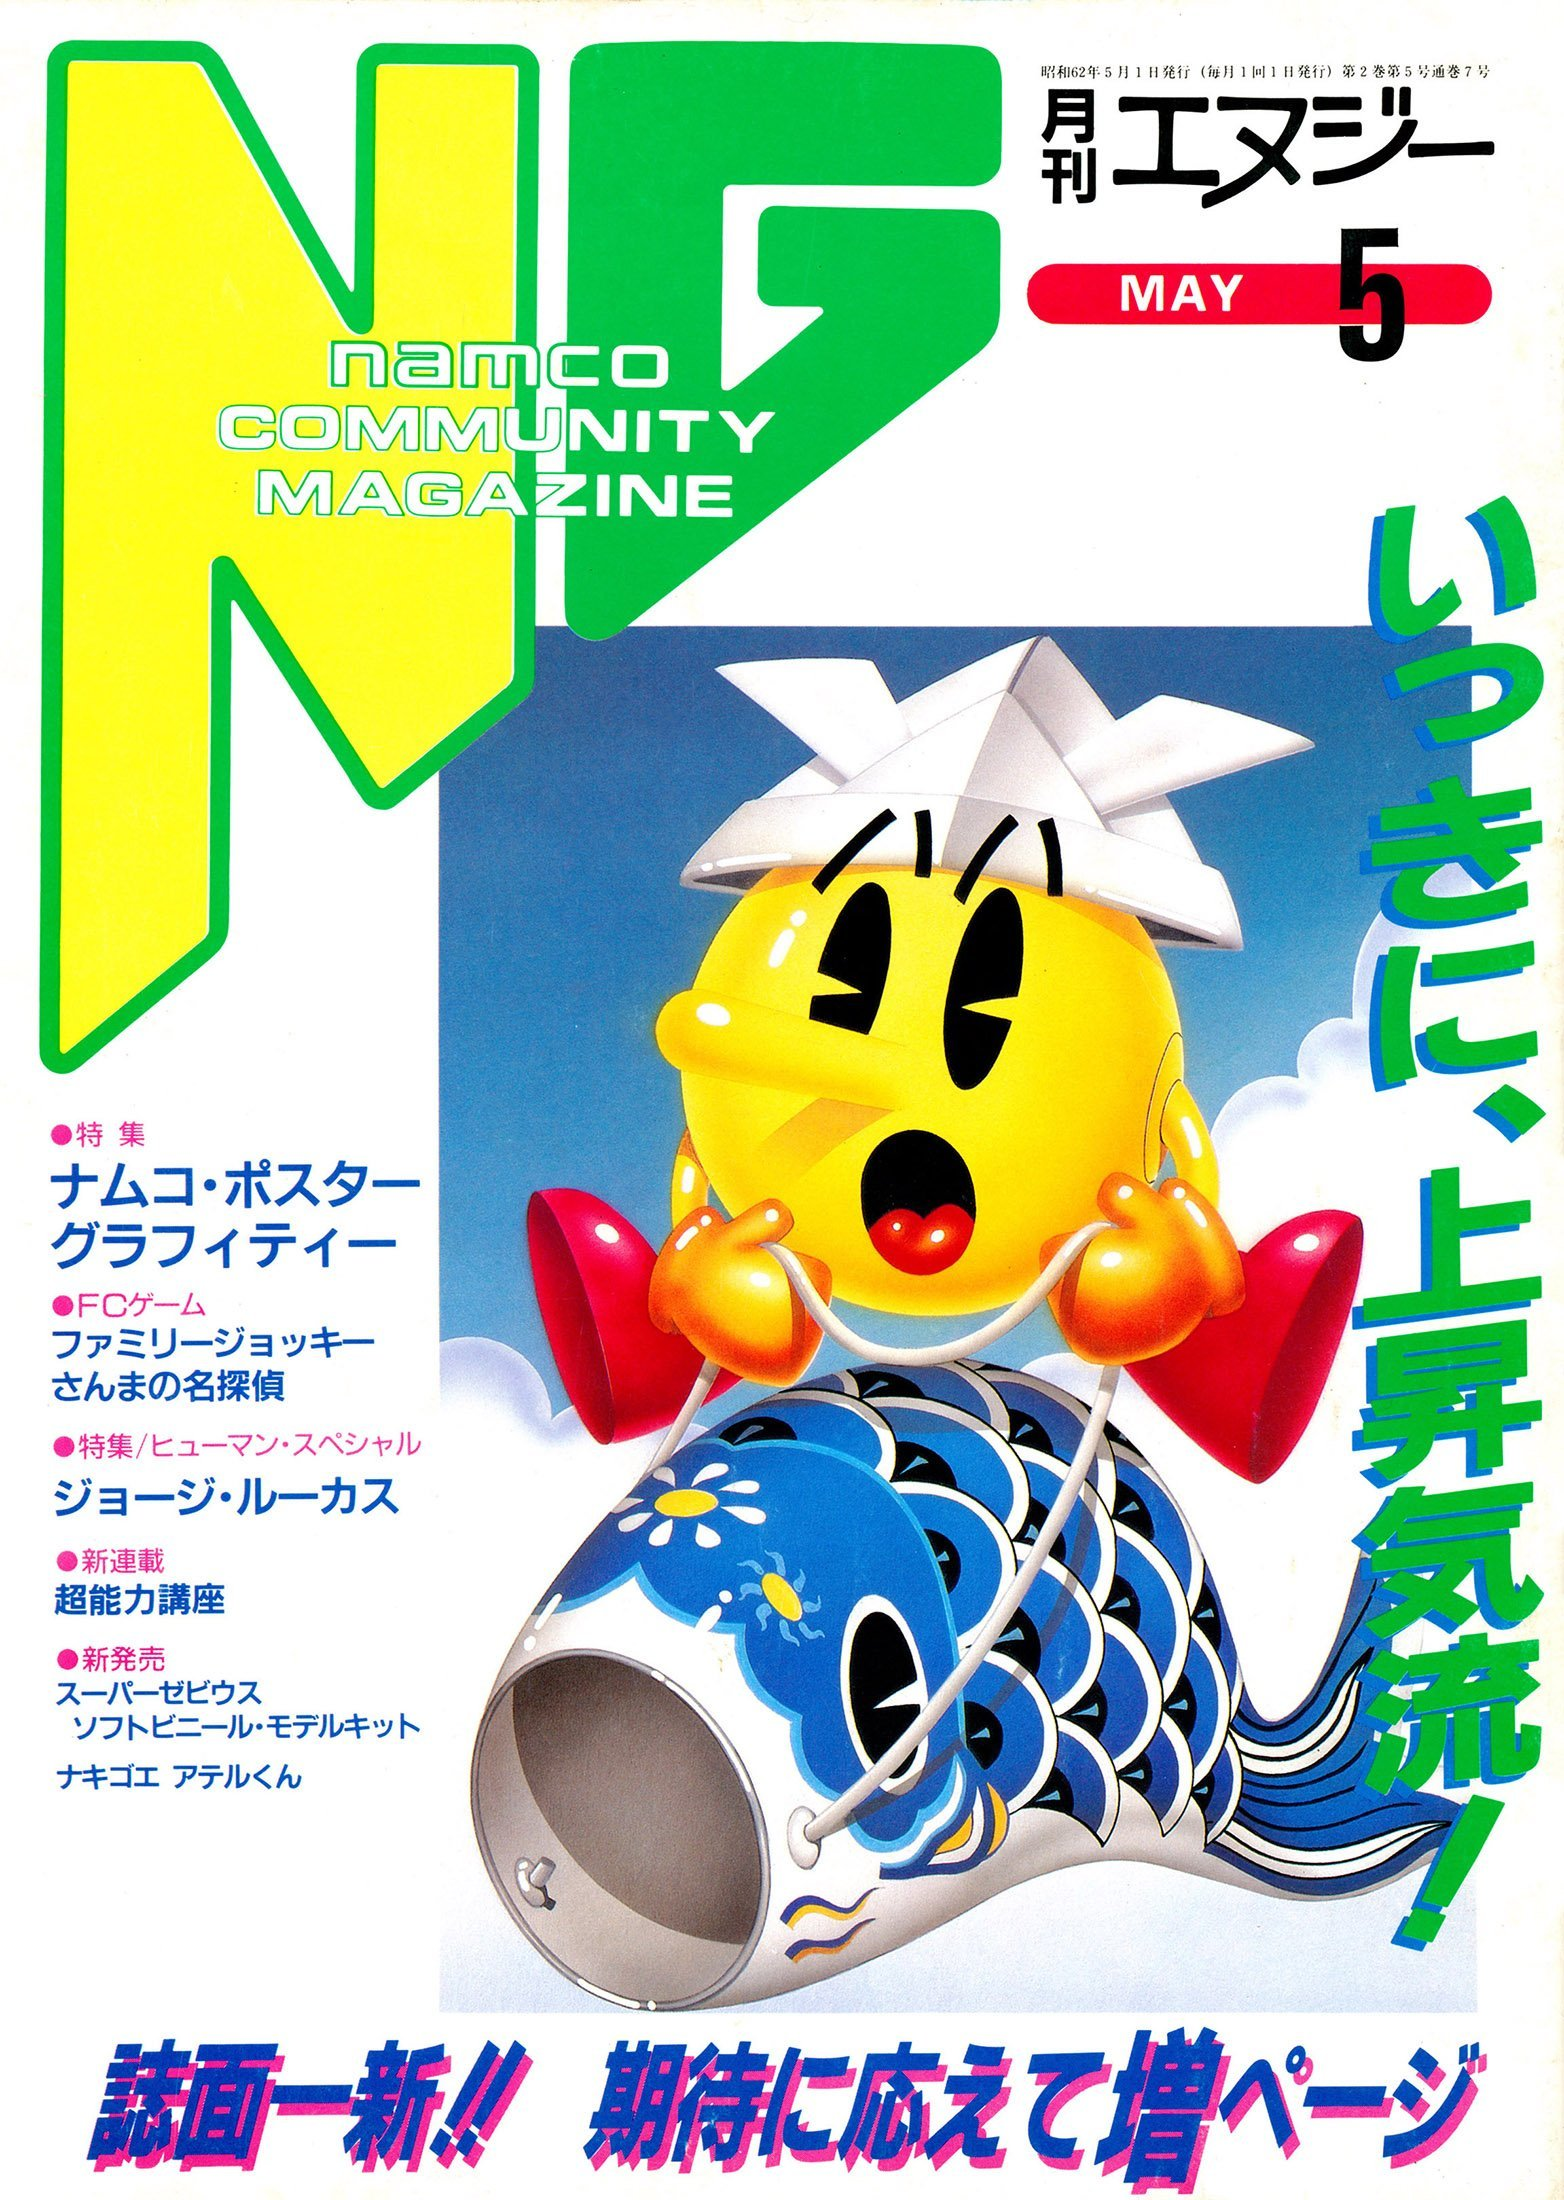 NG Namco Community Magazine Issue 07 (May 1987)